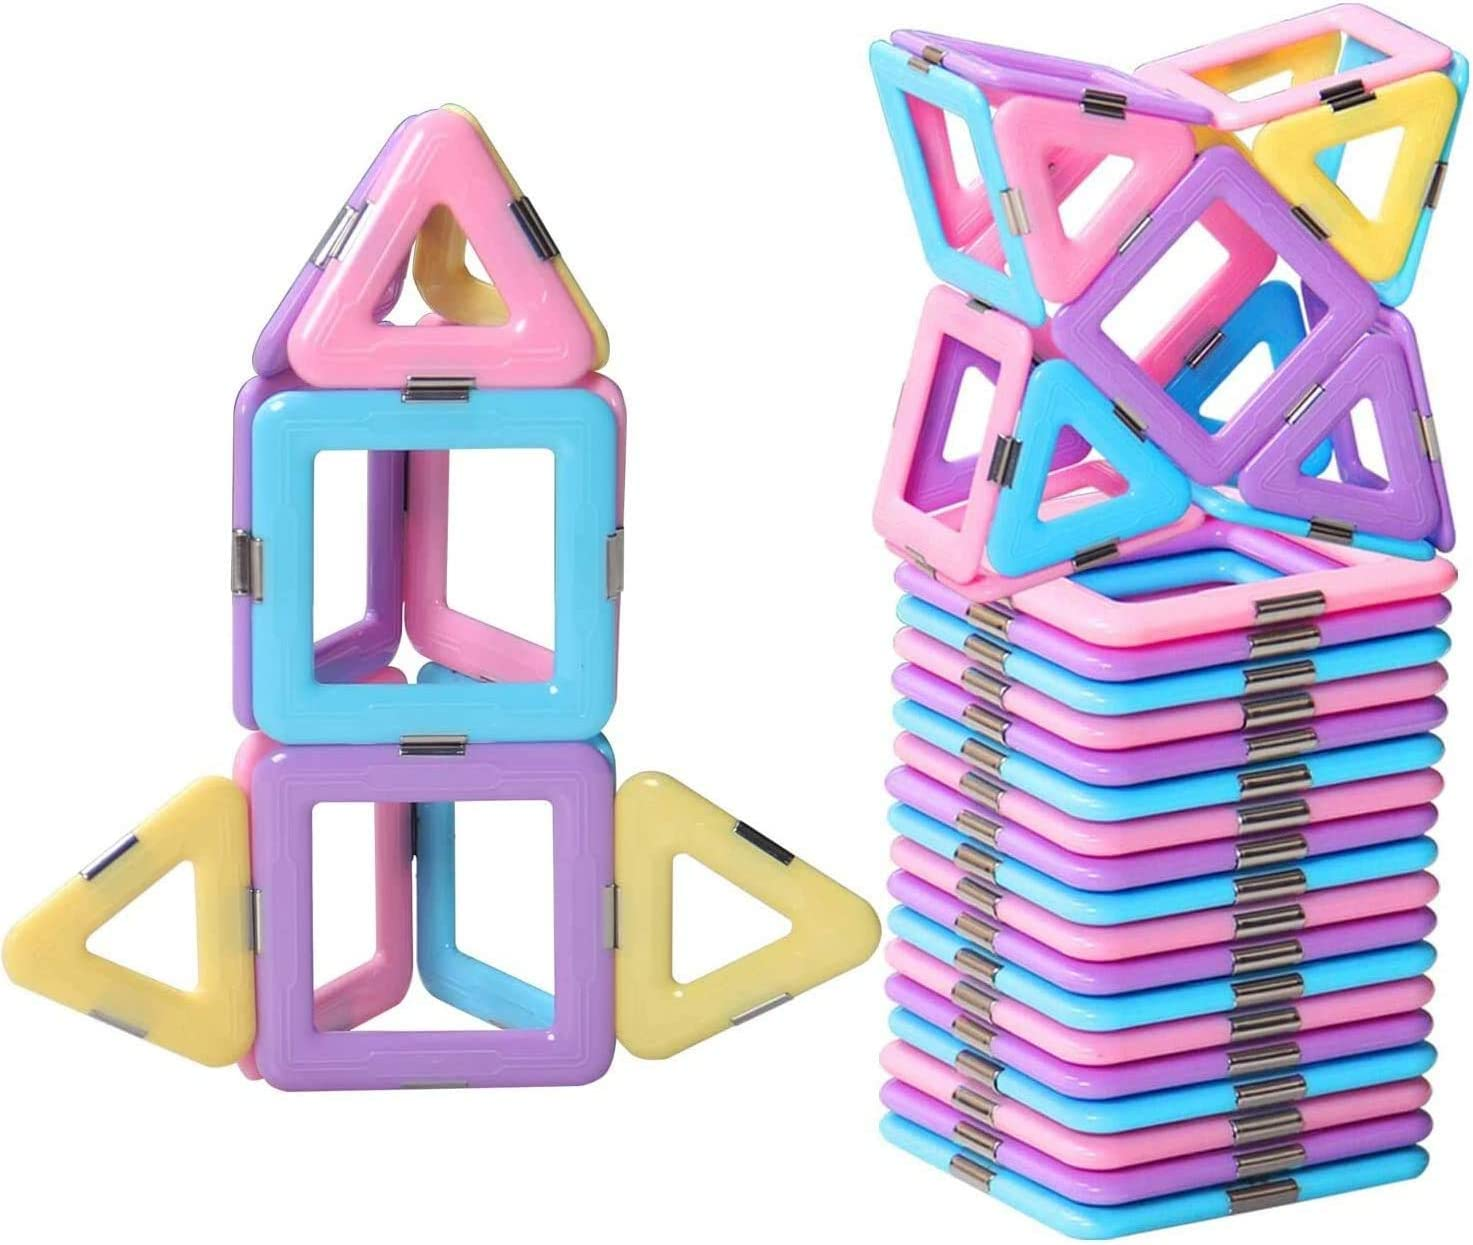 DEJUN Magnetic Dealing full price reduction Building Blocks Magnet Educational Long-awaited fo Tiles Toys